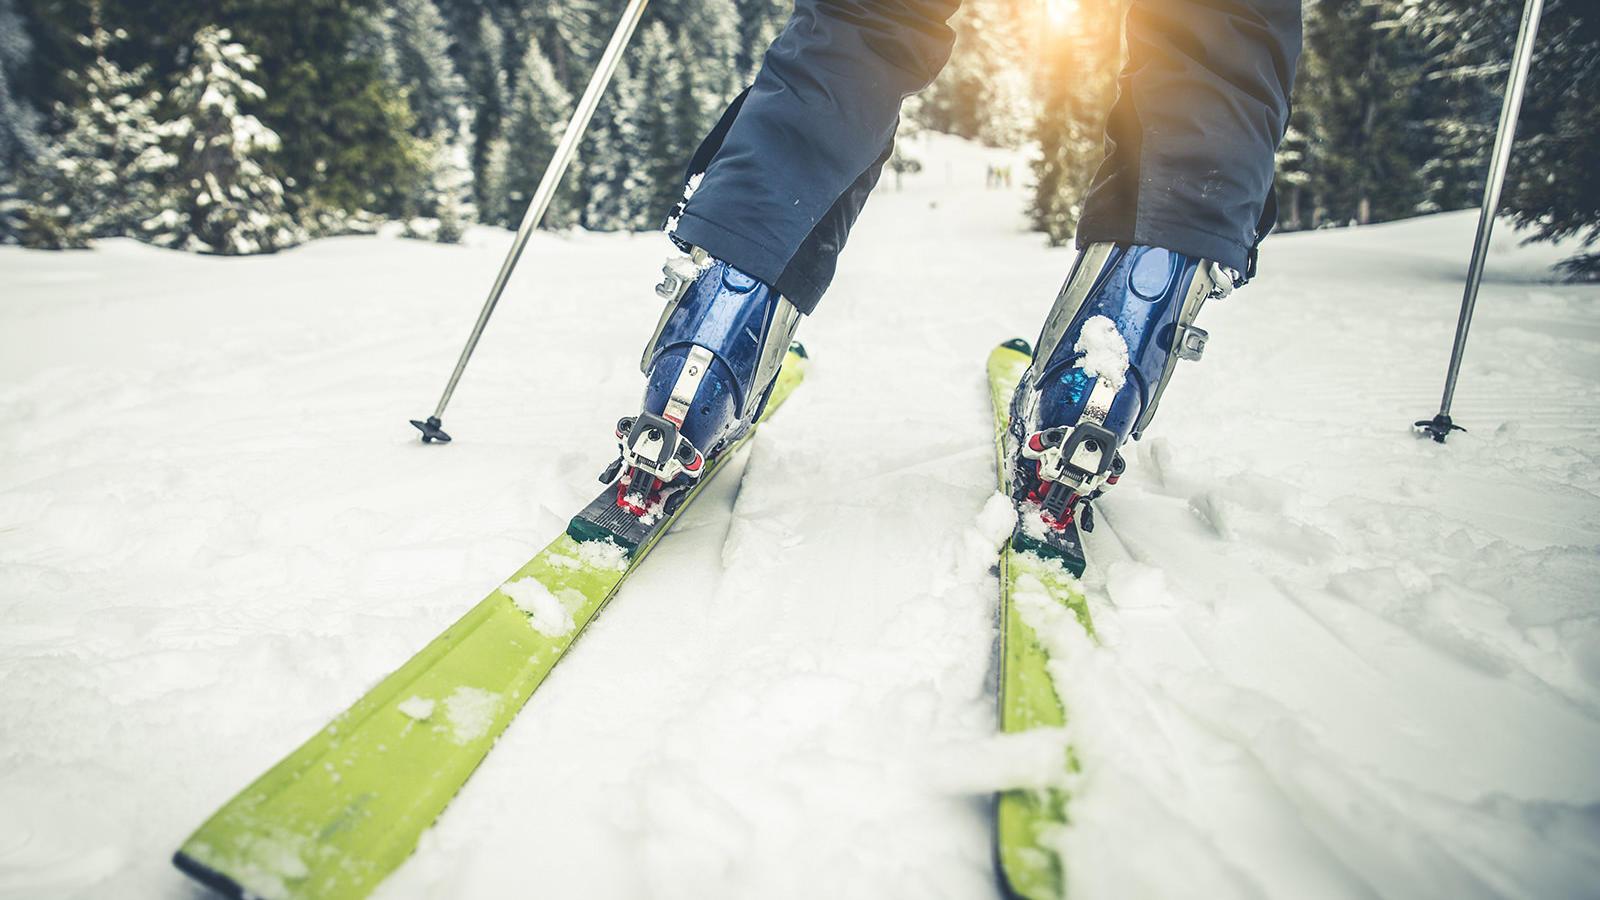 Bogus Basin Skiier